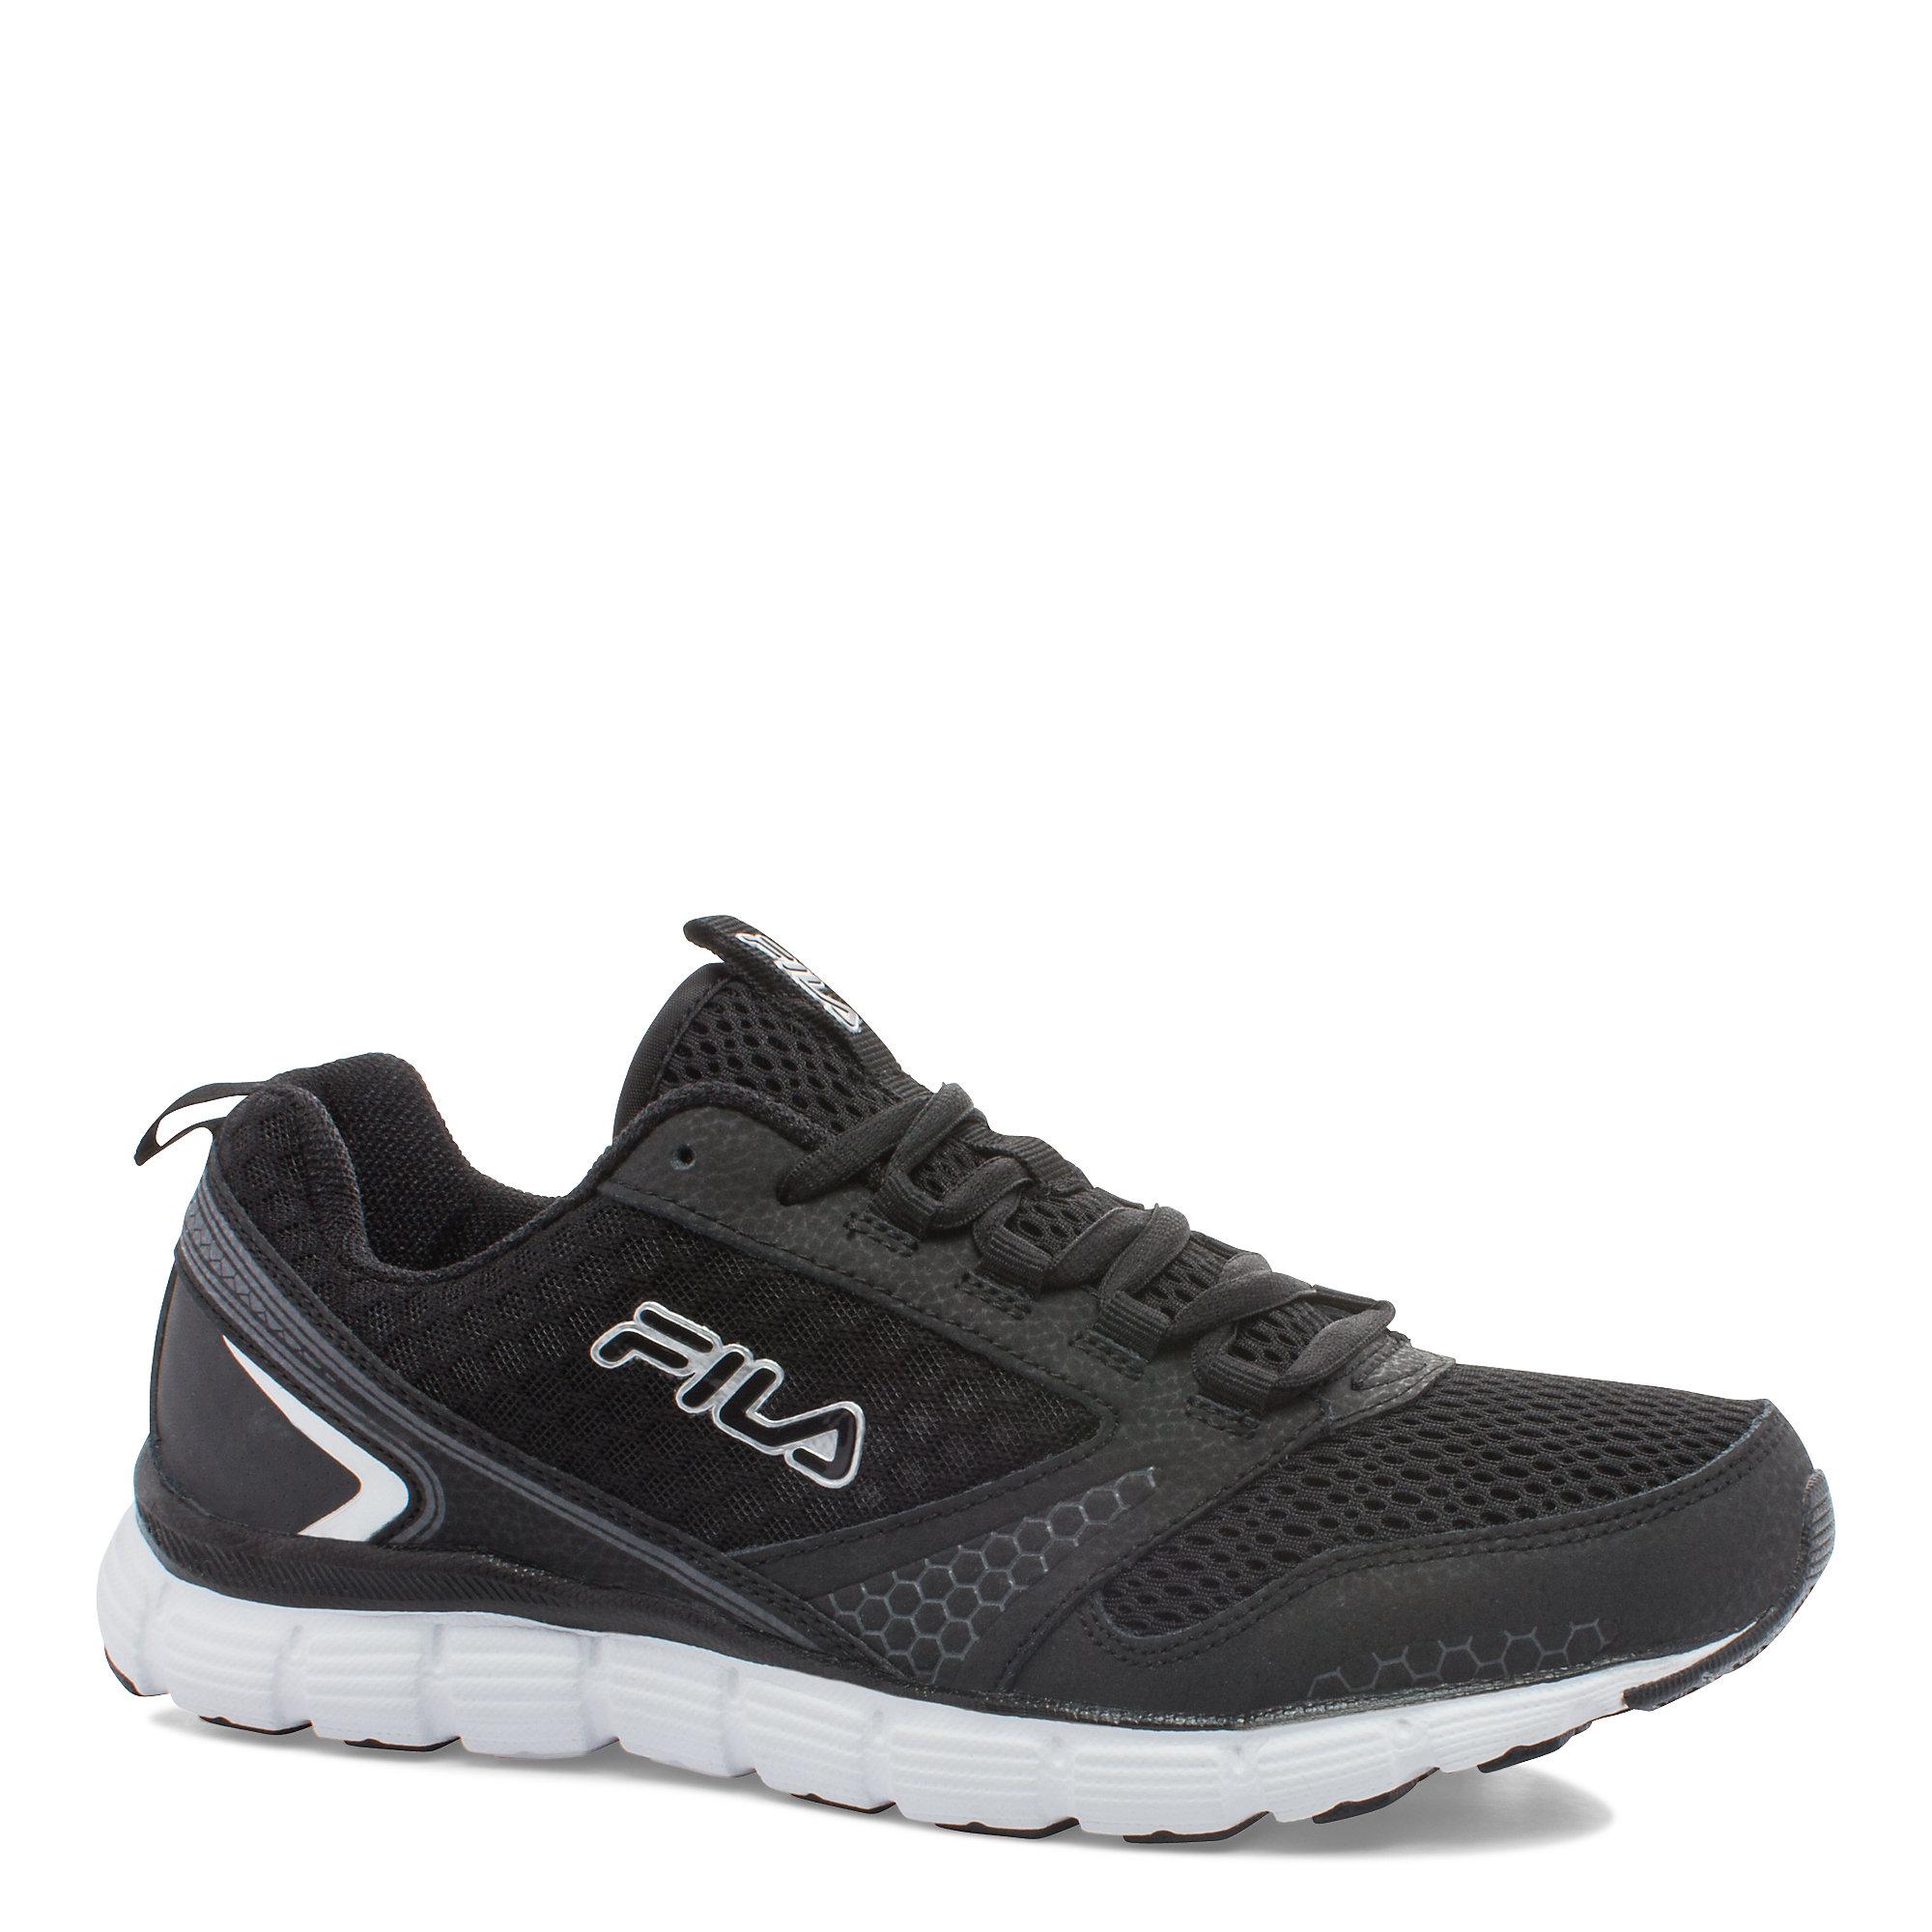 Fila Men's Memory Windstar Running Shoes